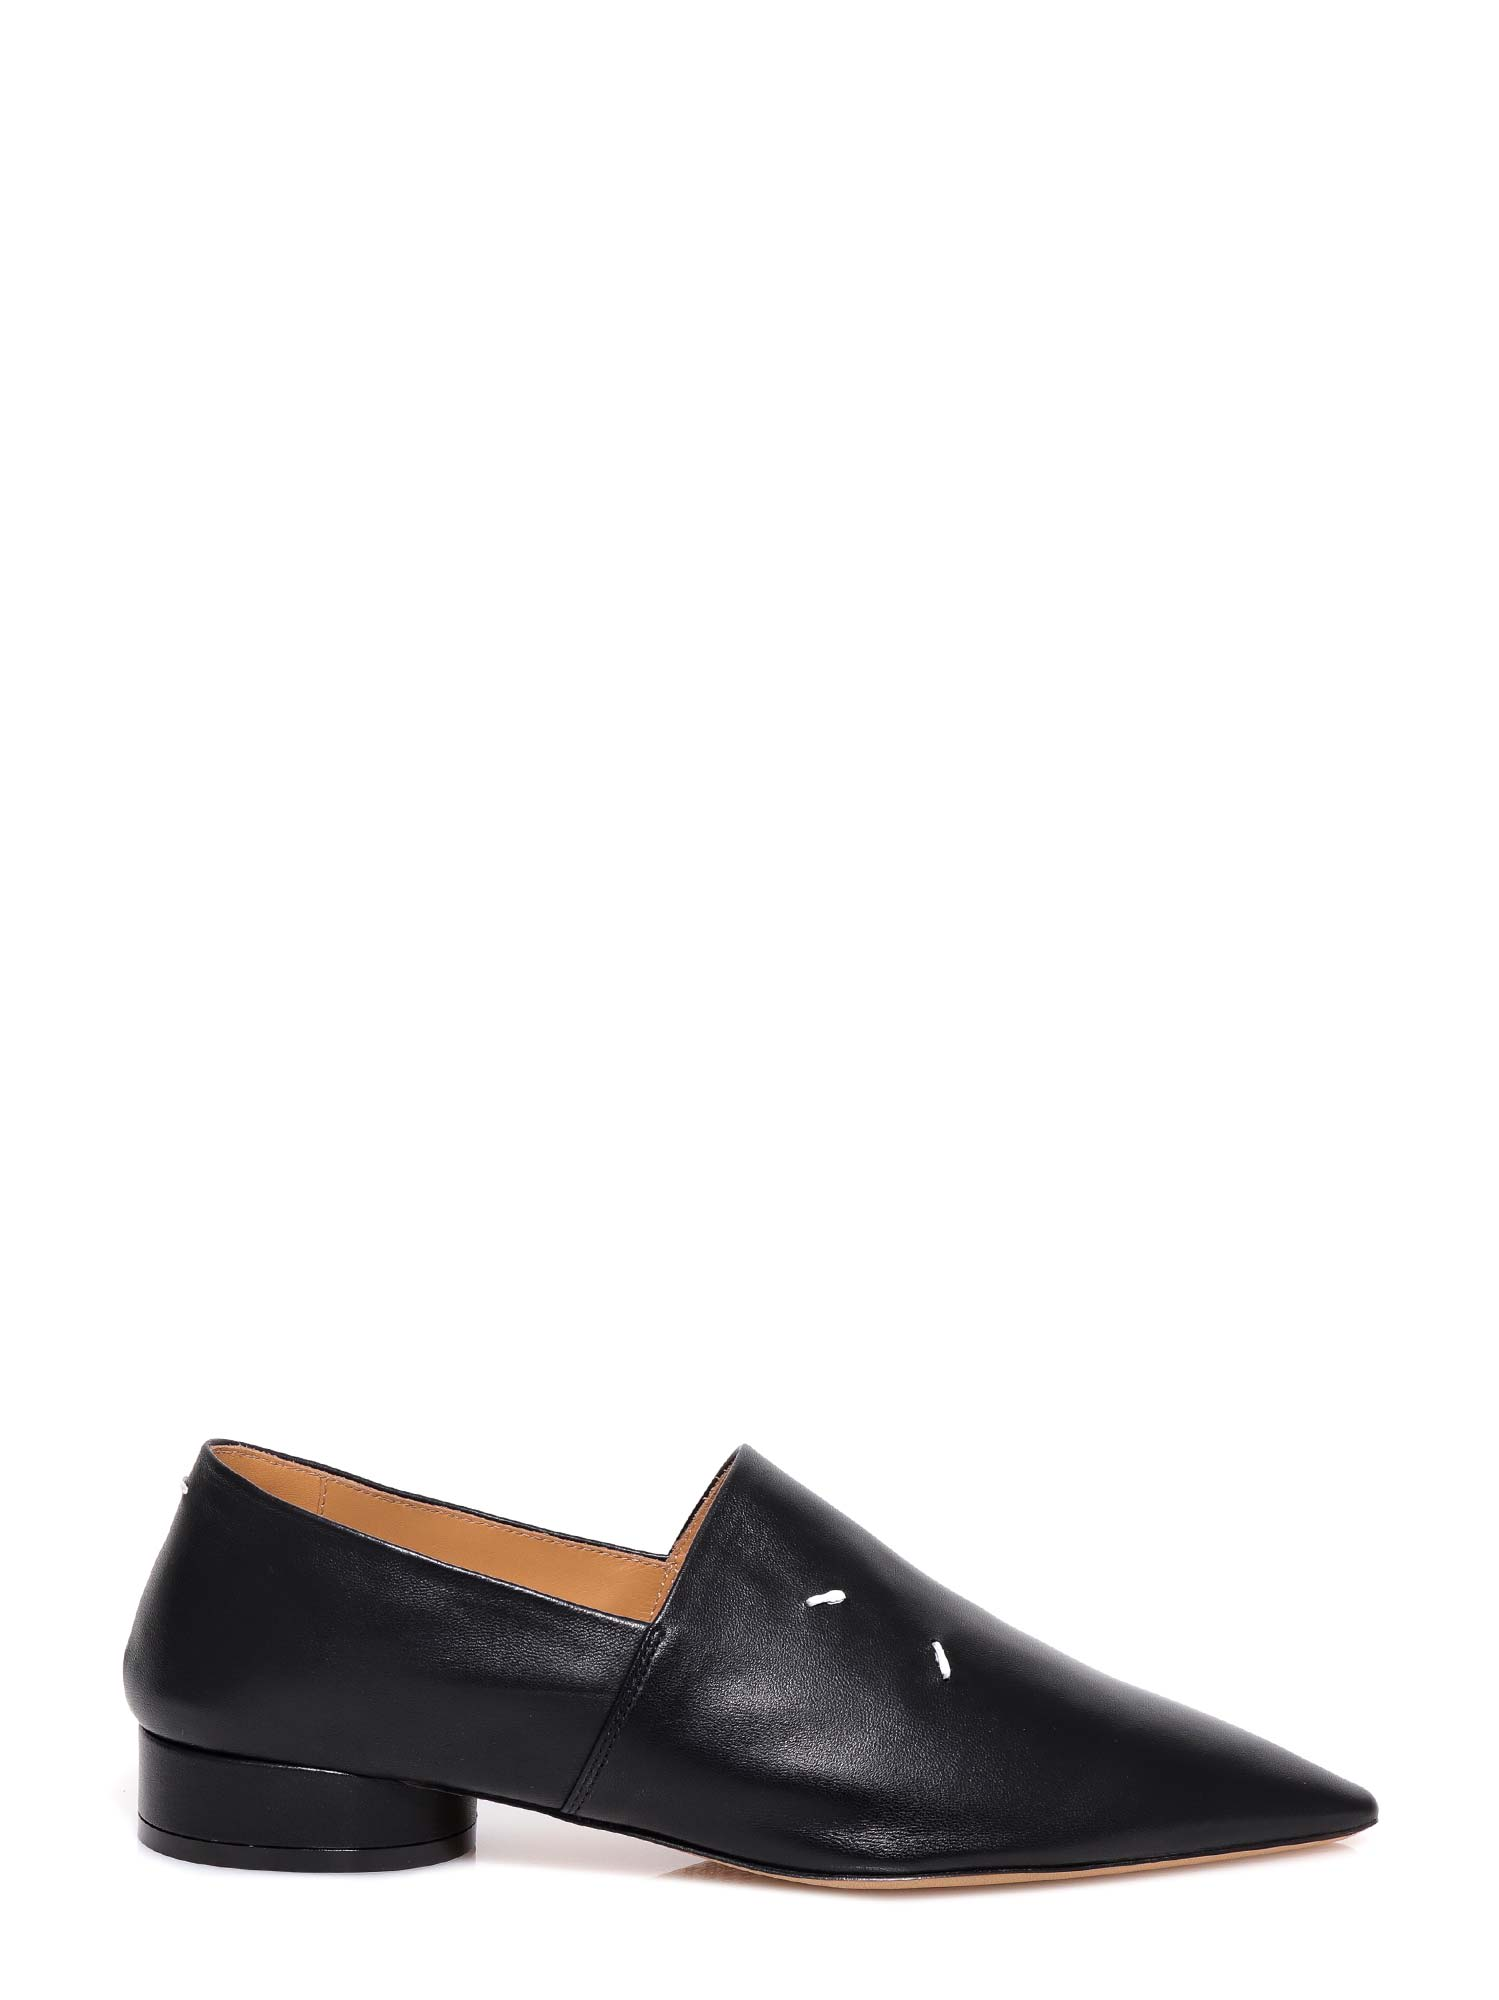 Buy Maison Margiela Loafer online, shop Maison Margiela shoes with free shipping